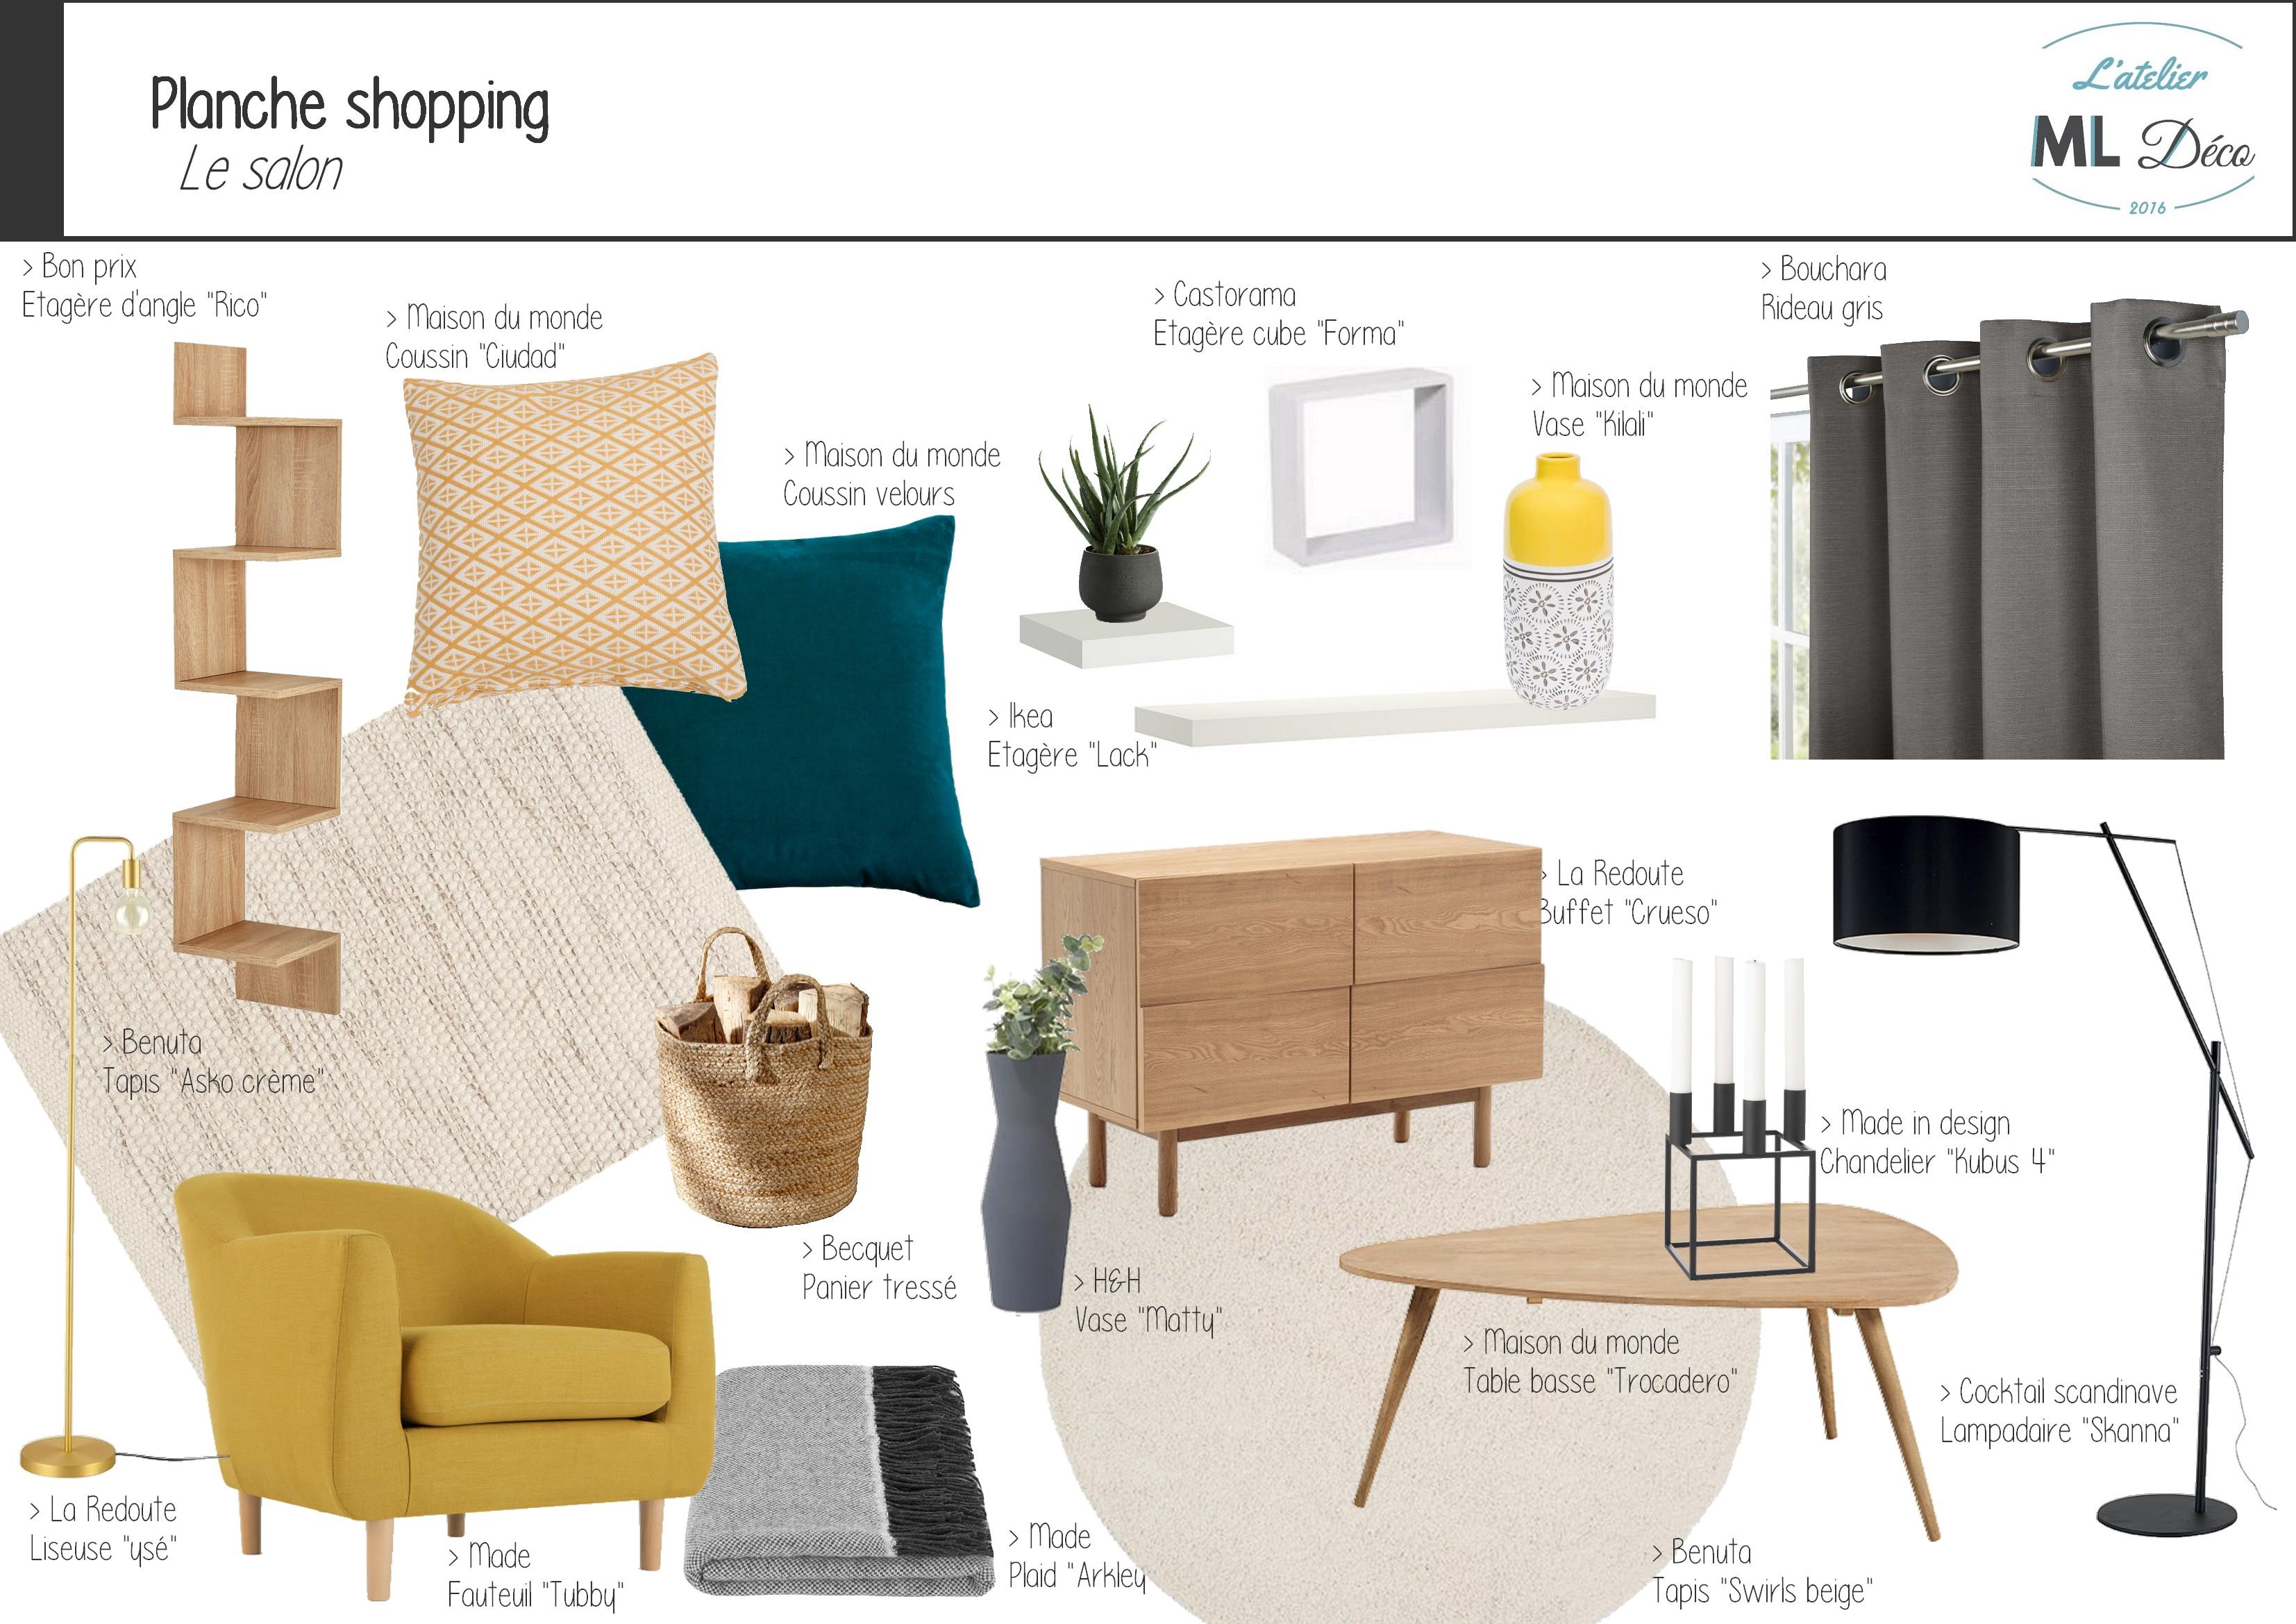 Planche shopping - Le salon.jpg